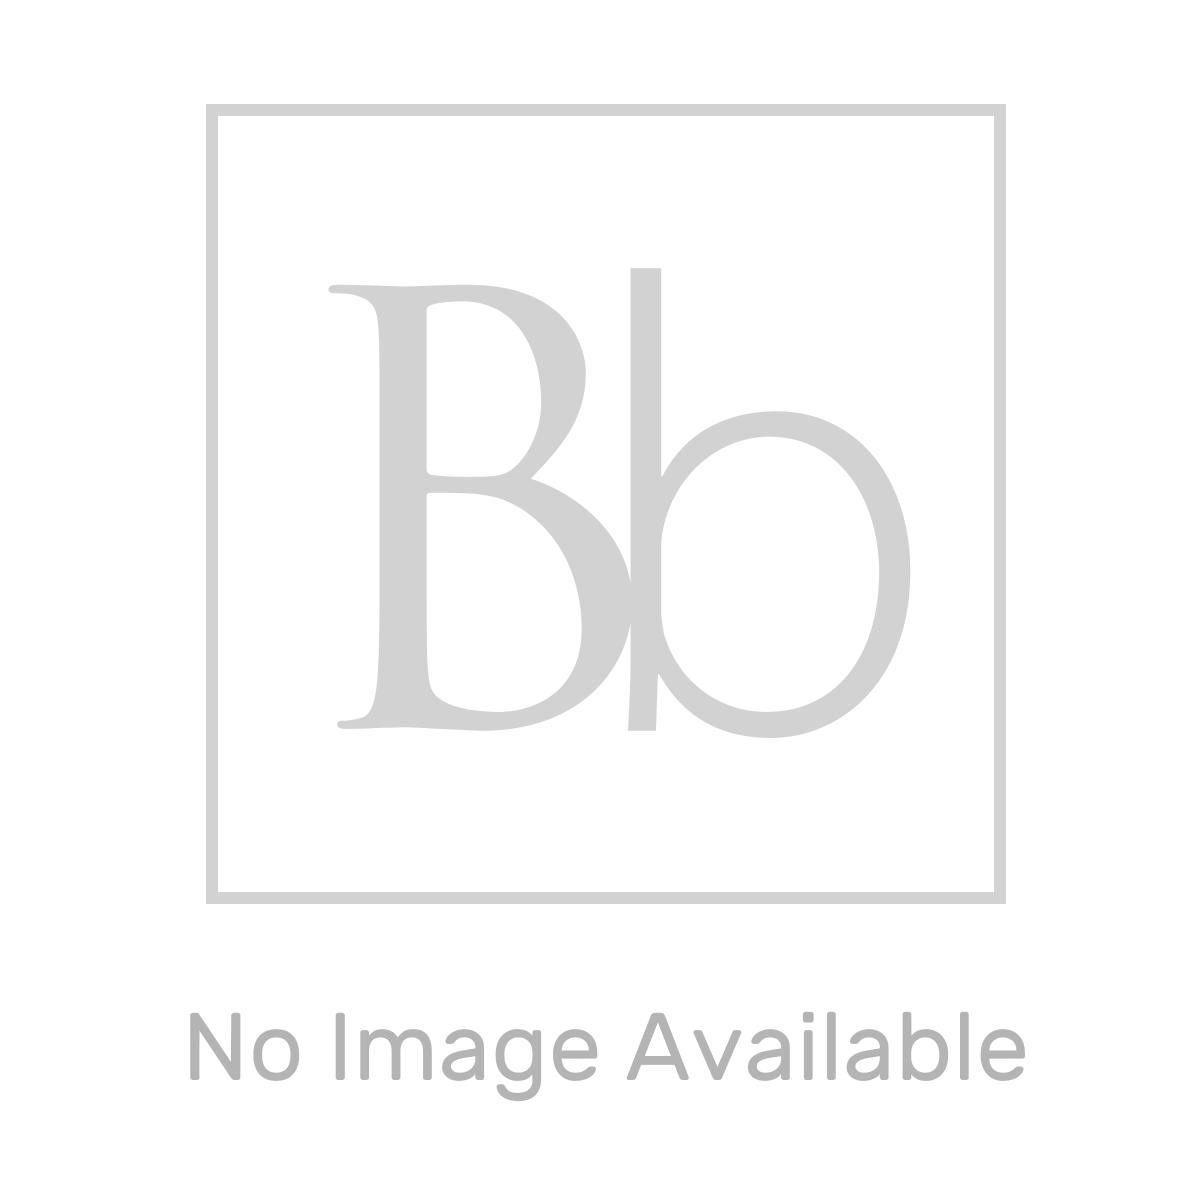 Frontline Compact Luxury Single Ended Bath